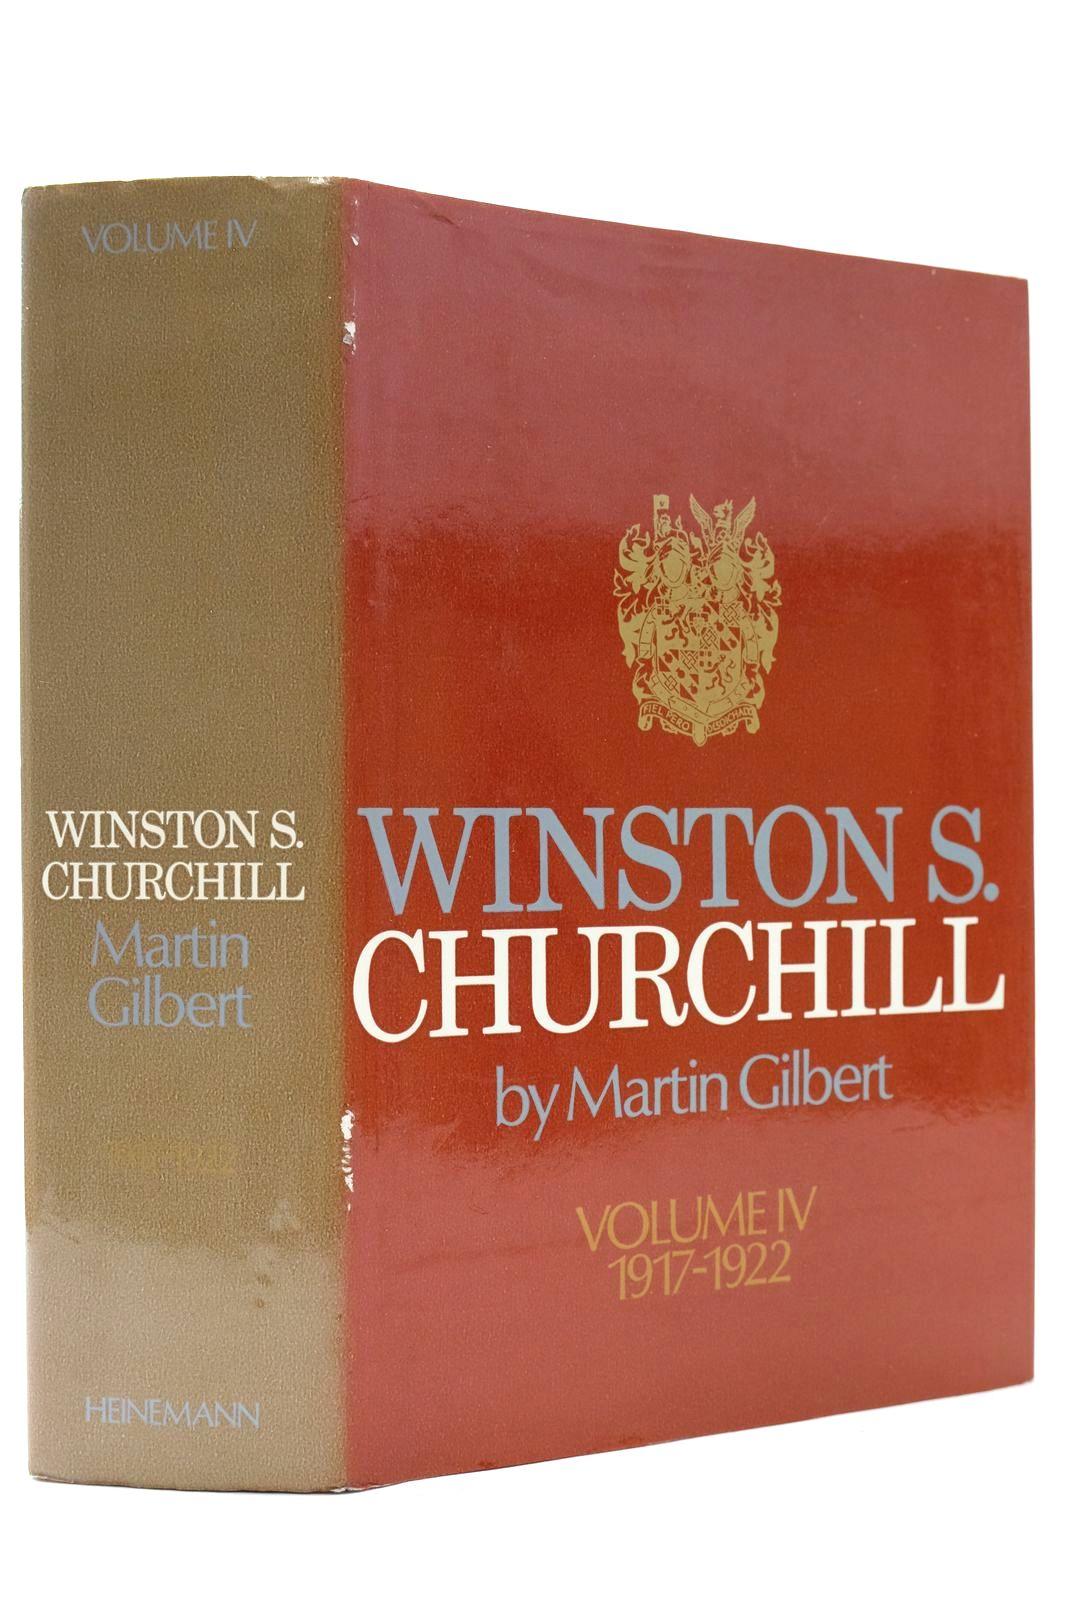 Photo of WINSTON S. CHURCHILL VOLUME IV 1917-1922- Stock Number: 2132686